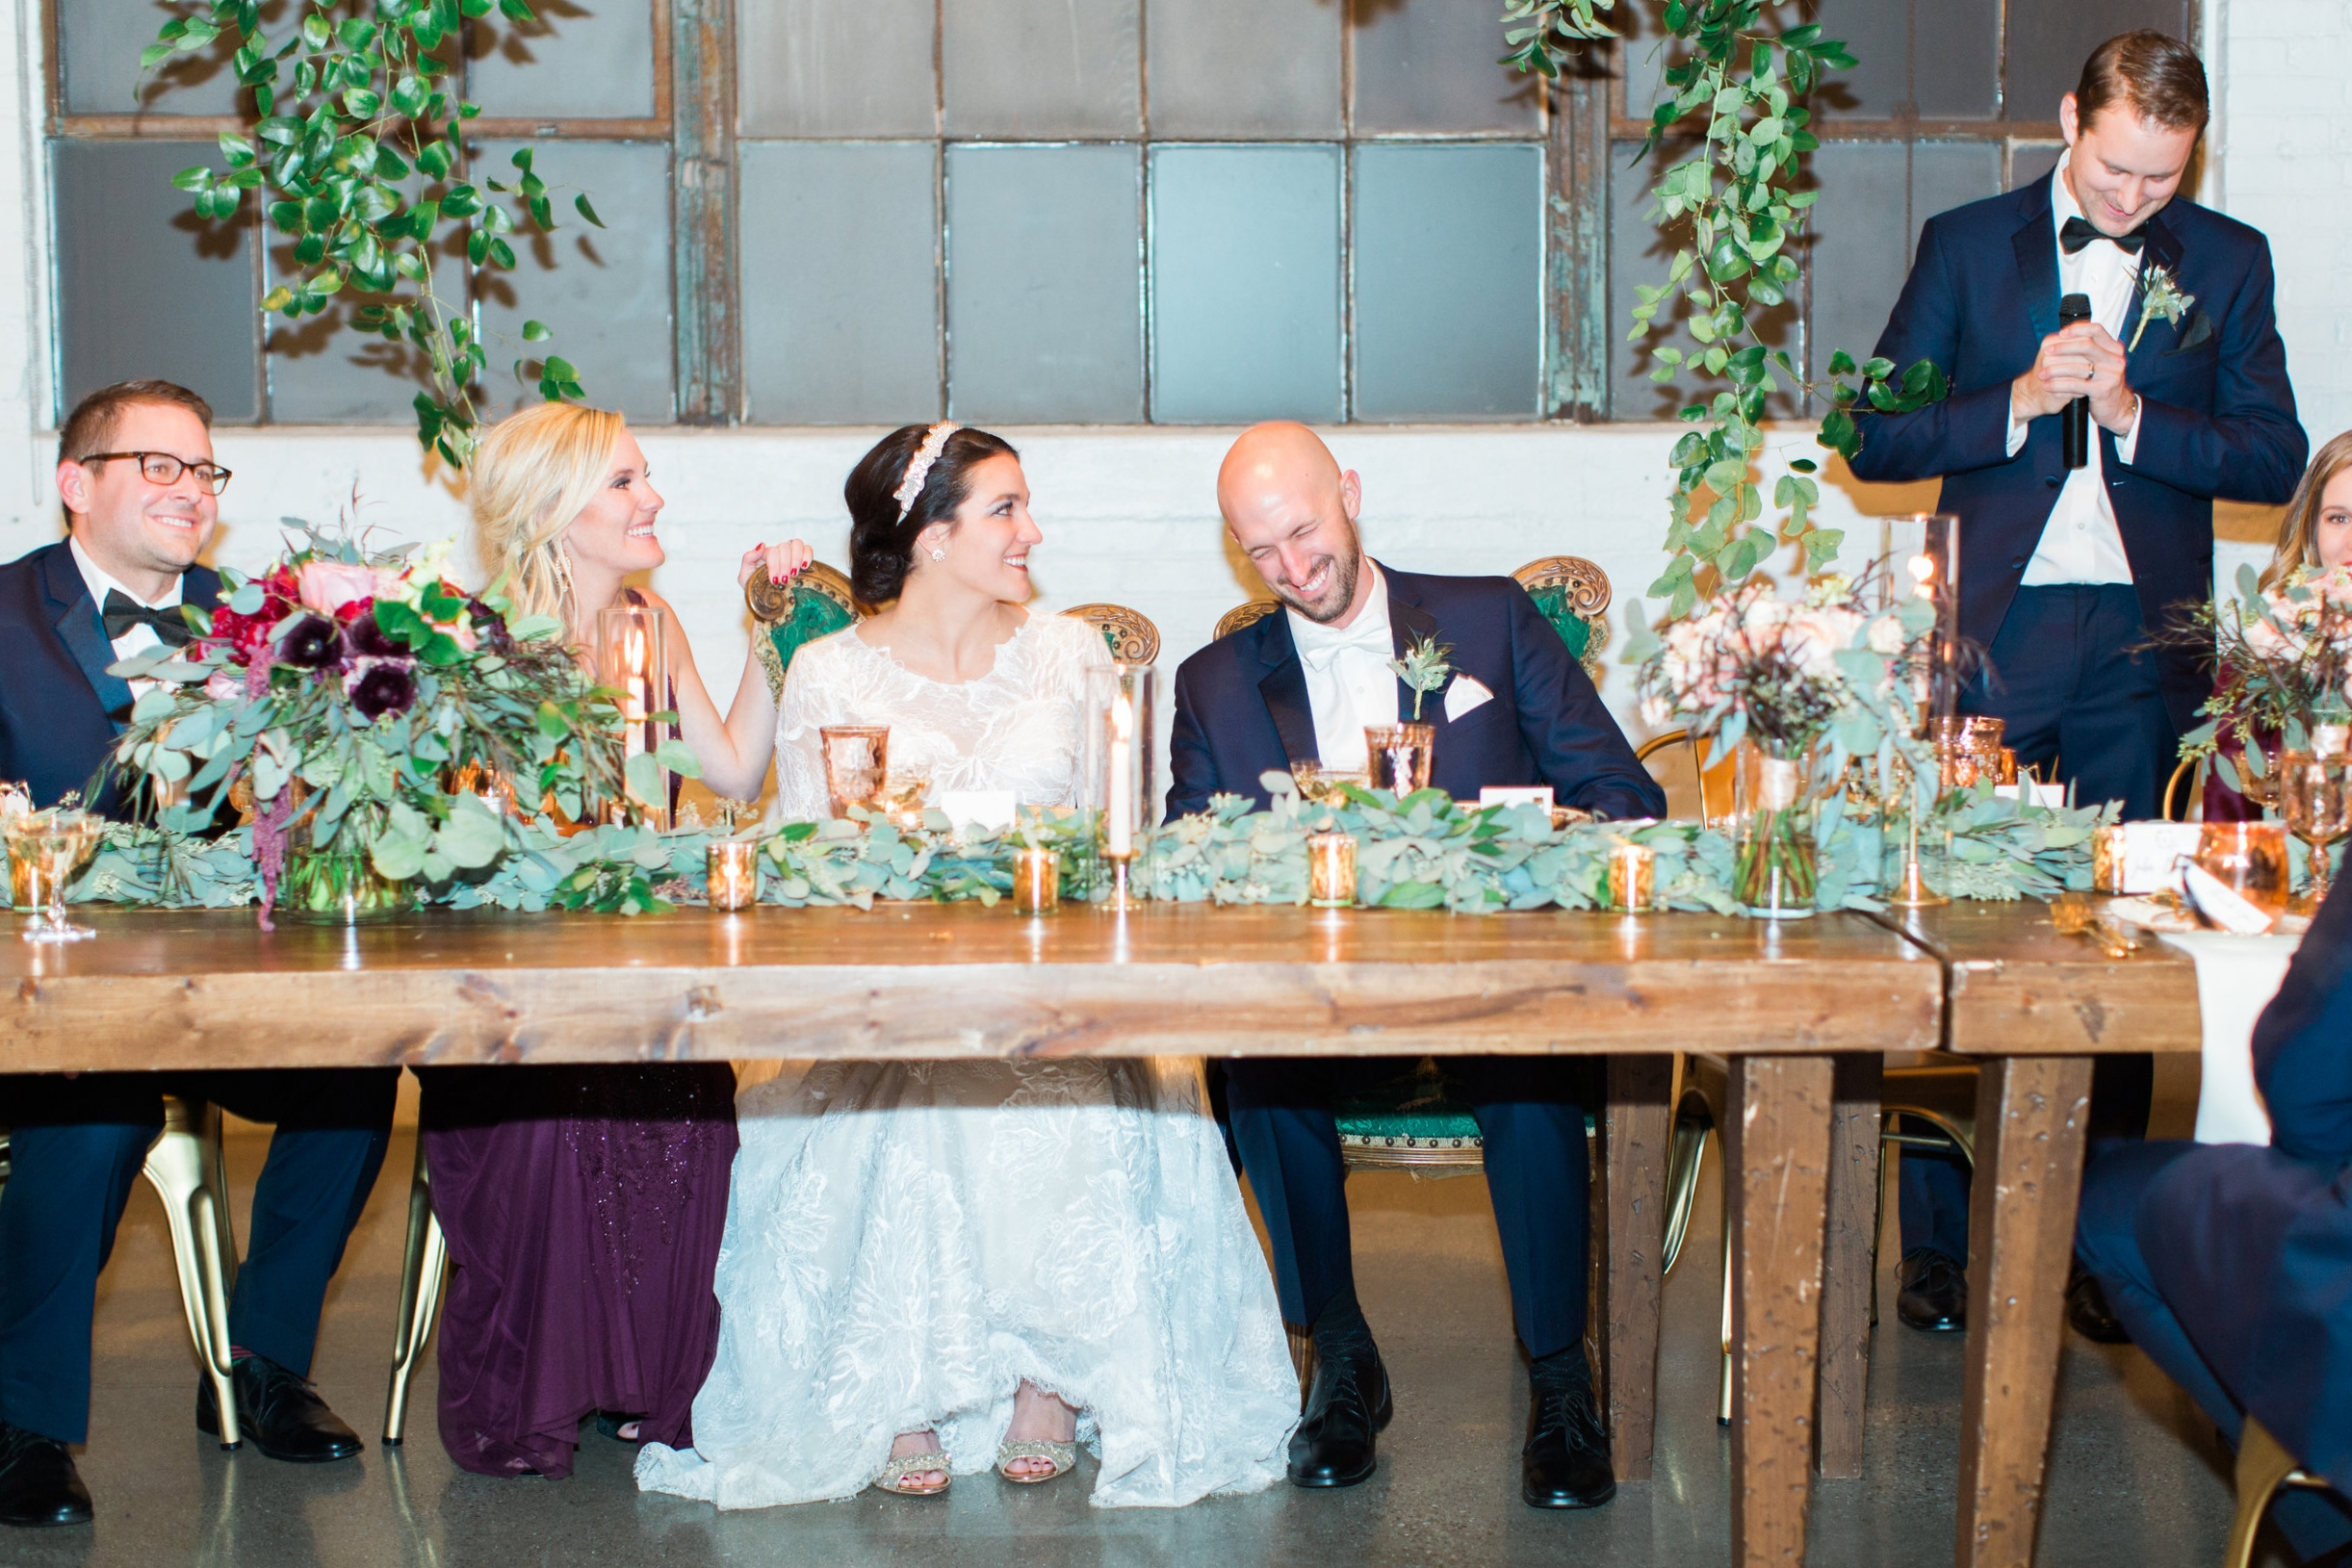 Vogelzang+Wedding+Receptionb-27.jpg